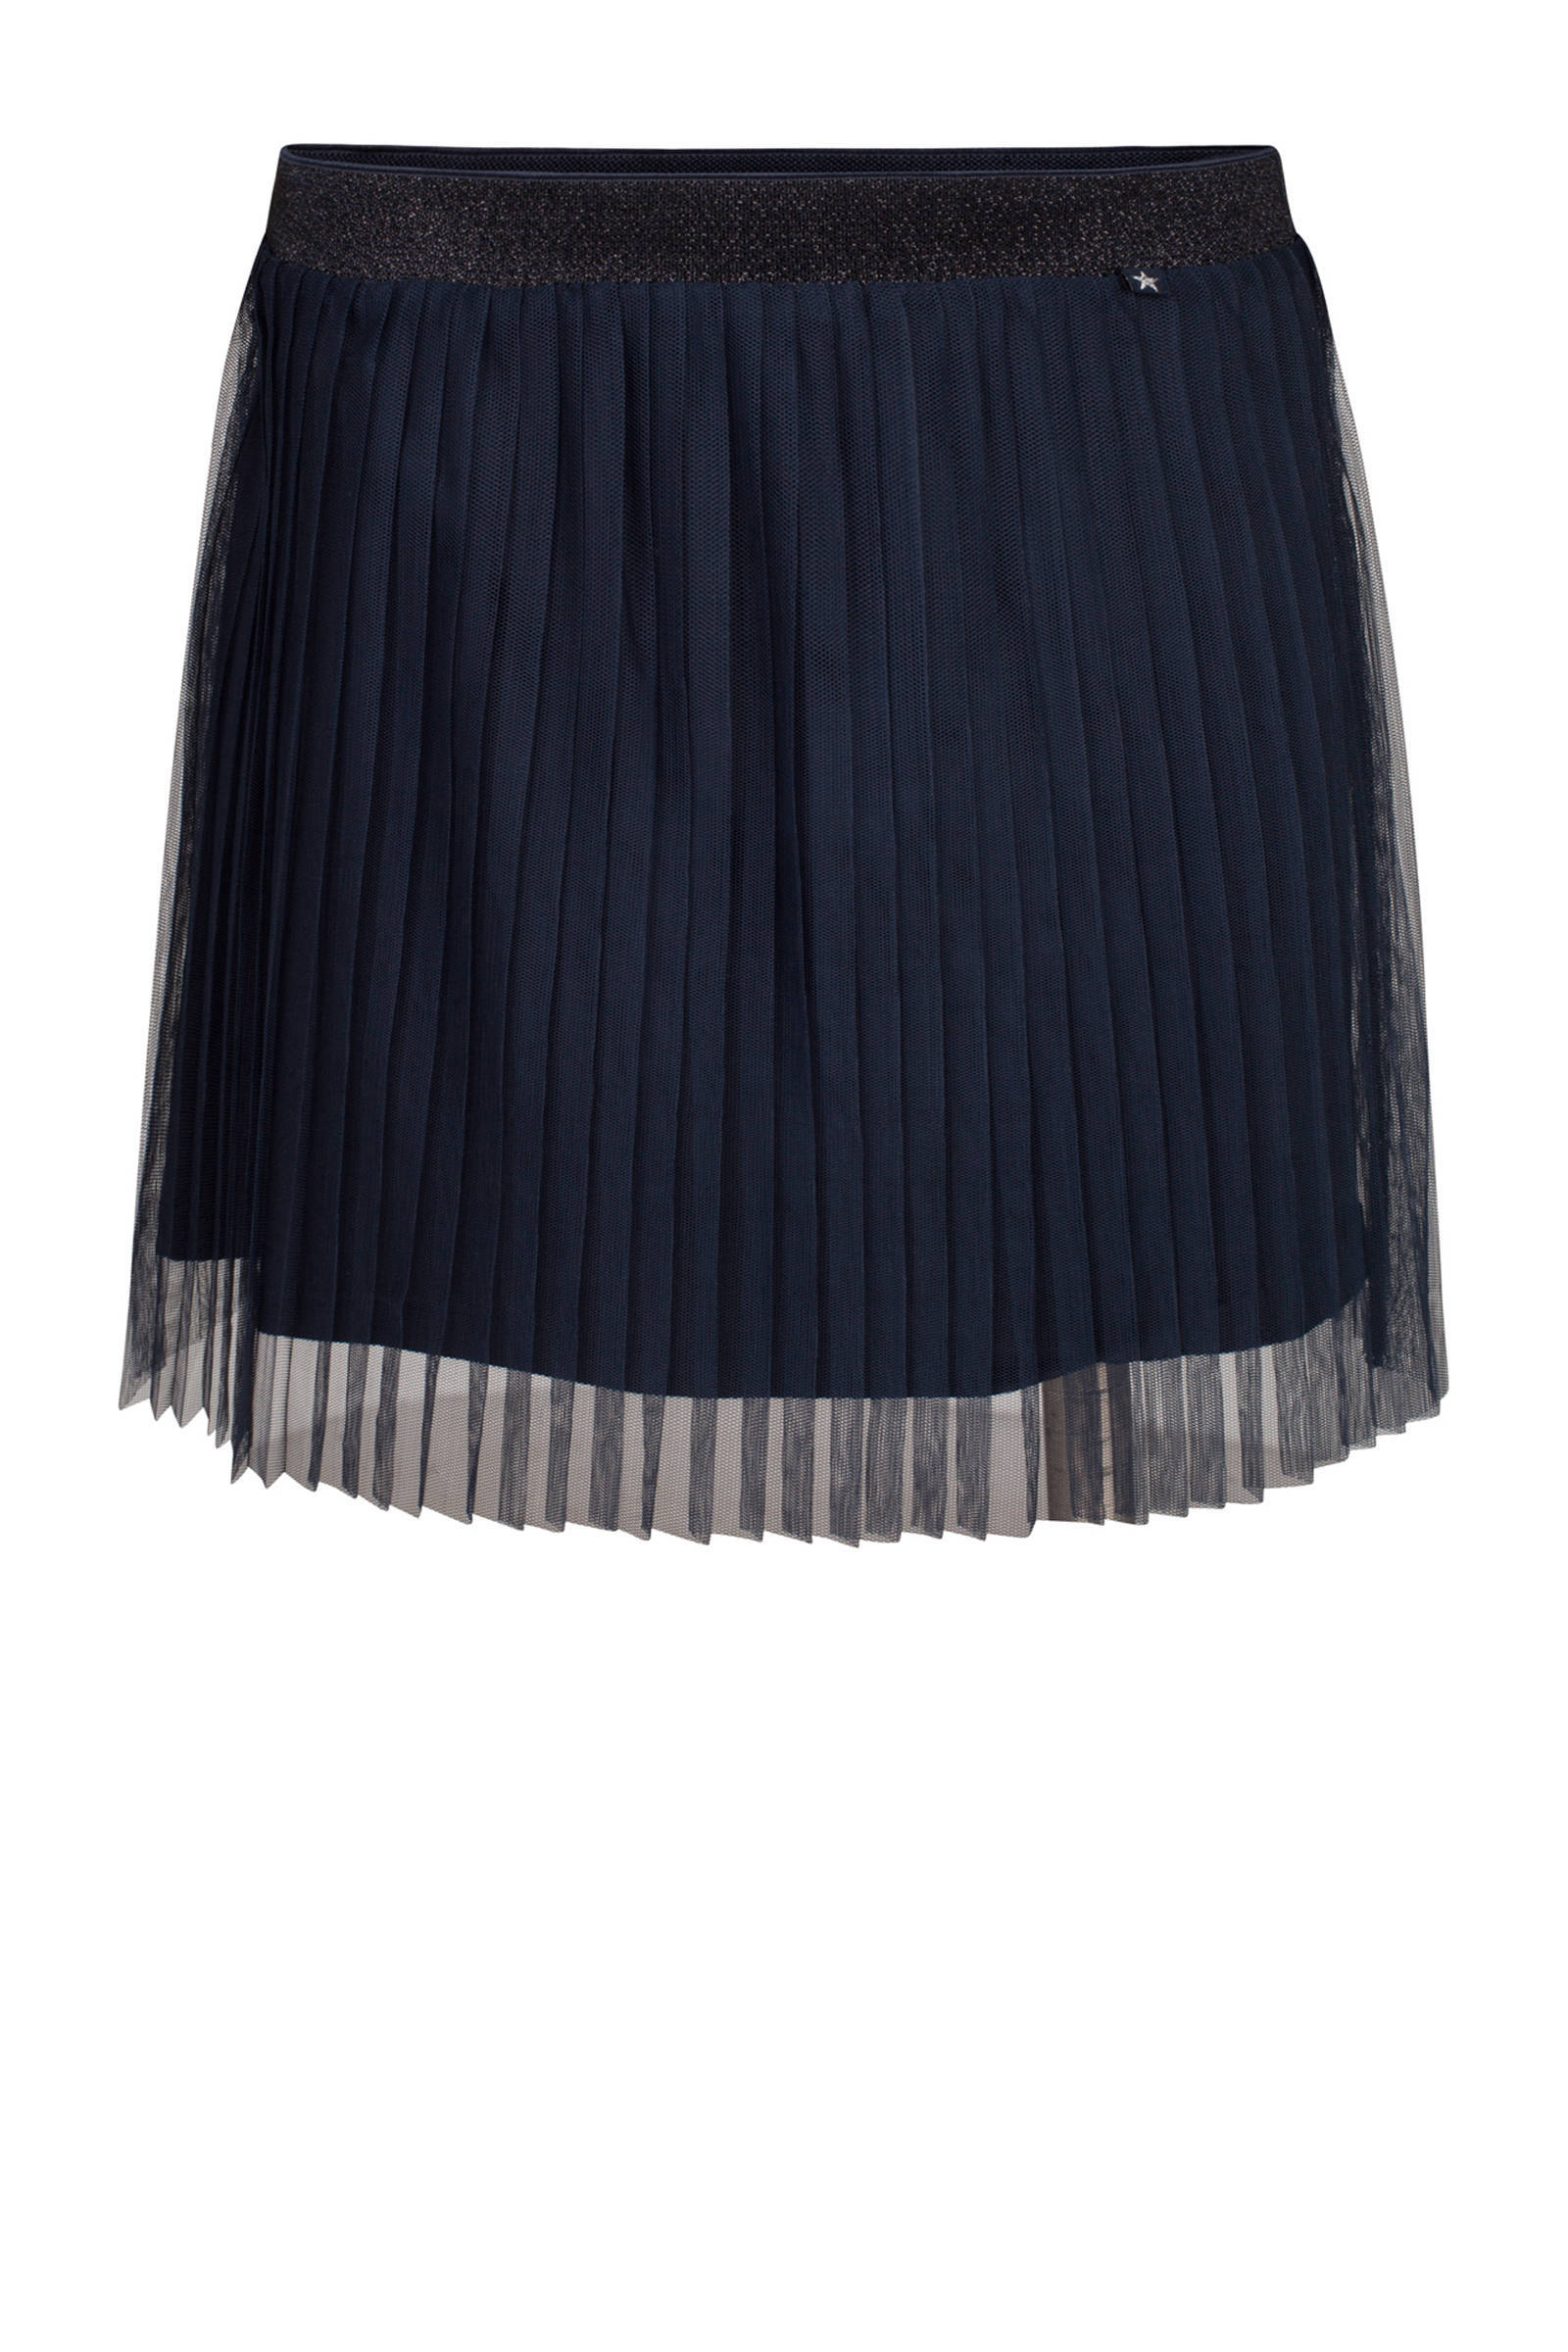 WE Fashion plissé tule rok donkerblauw